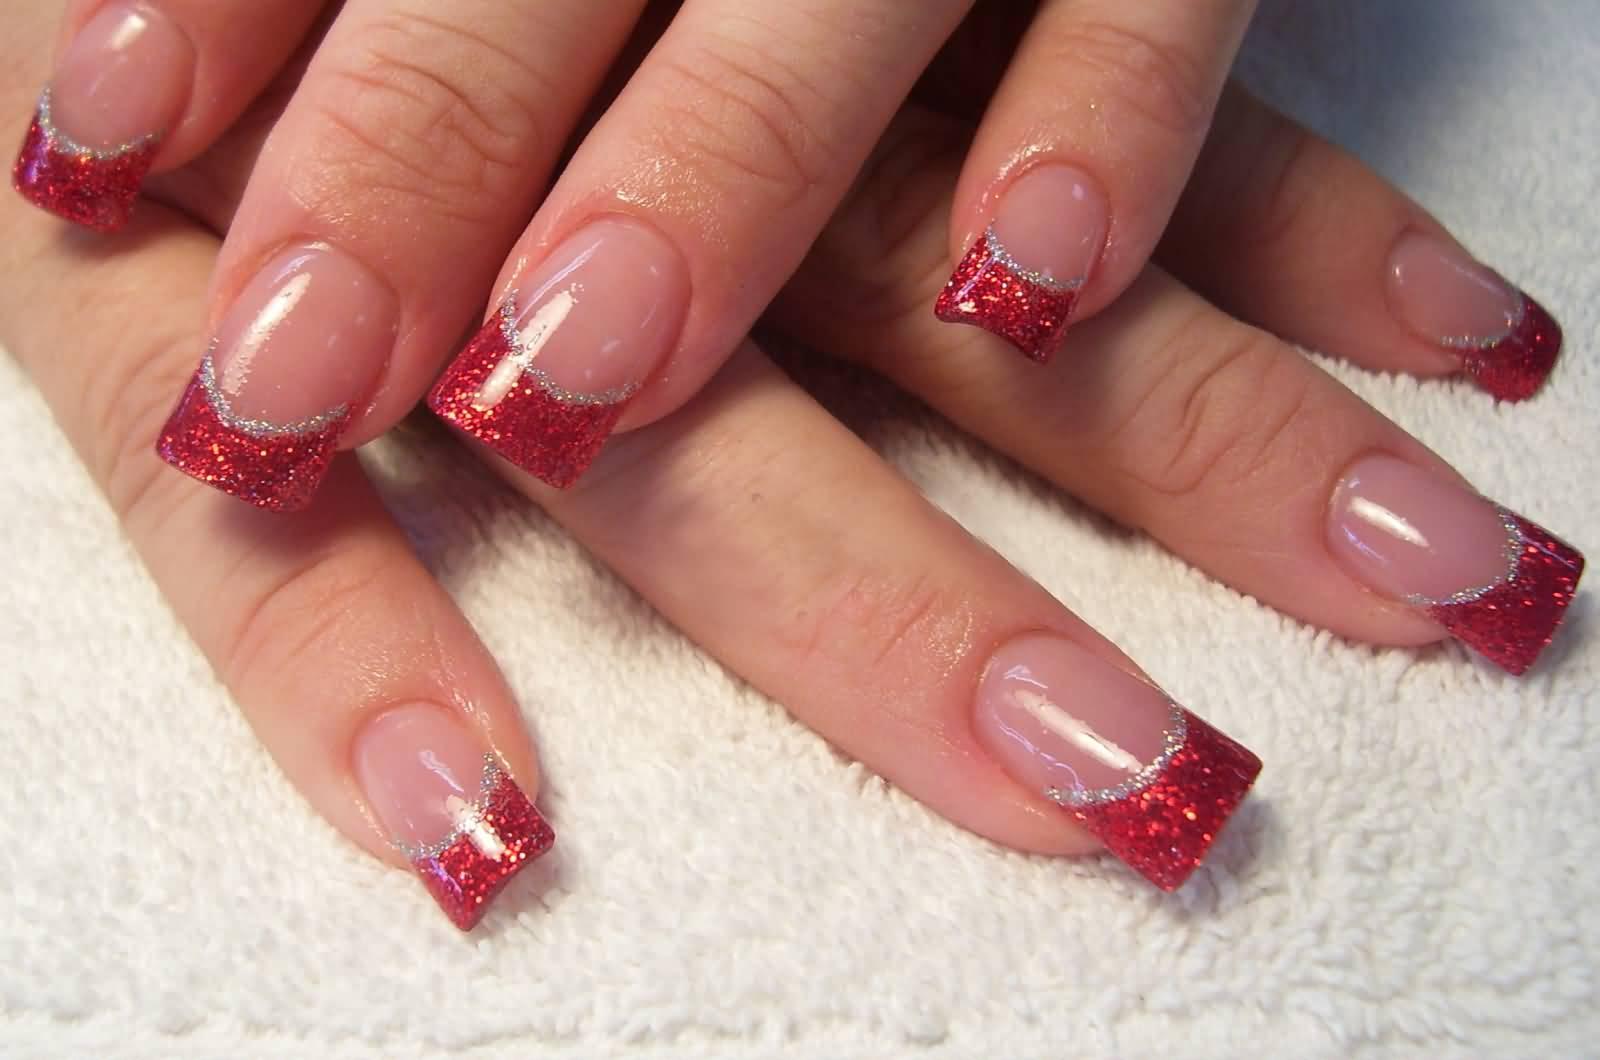 Red Tip Glitter Nail Art